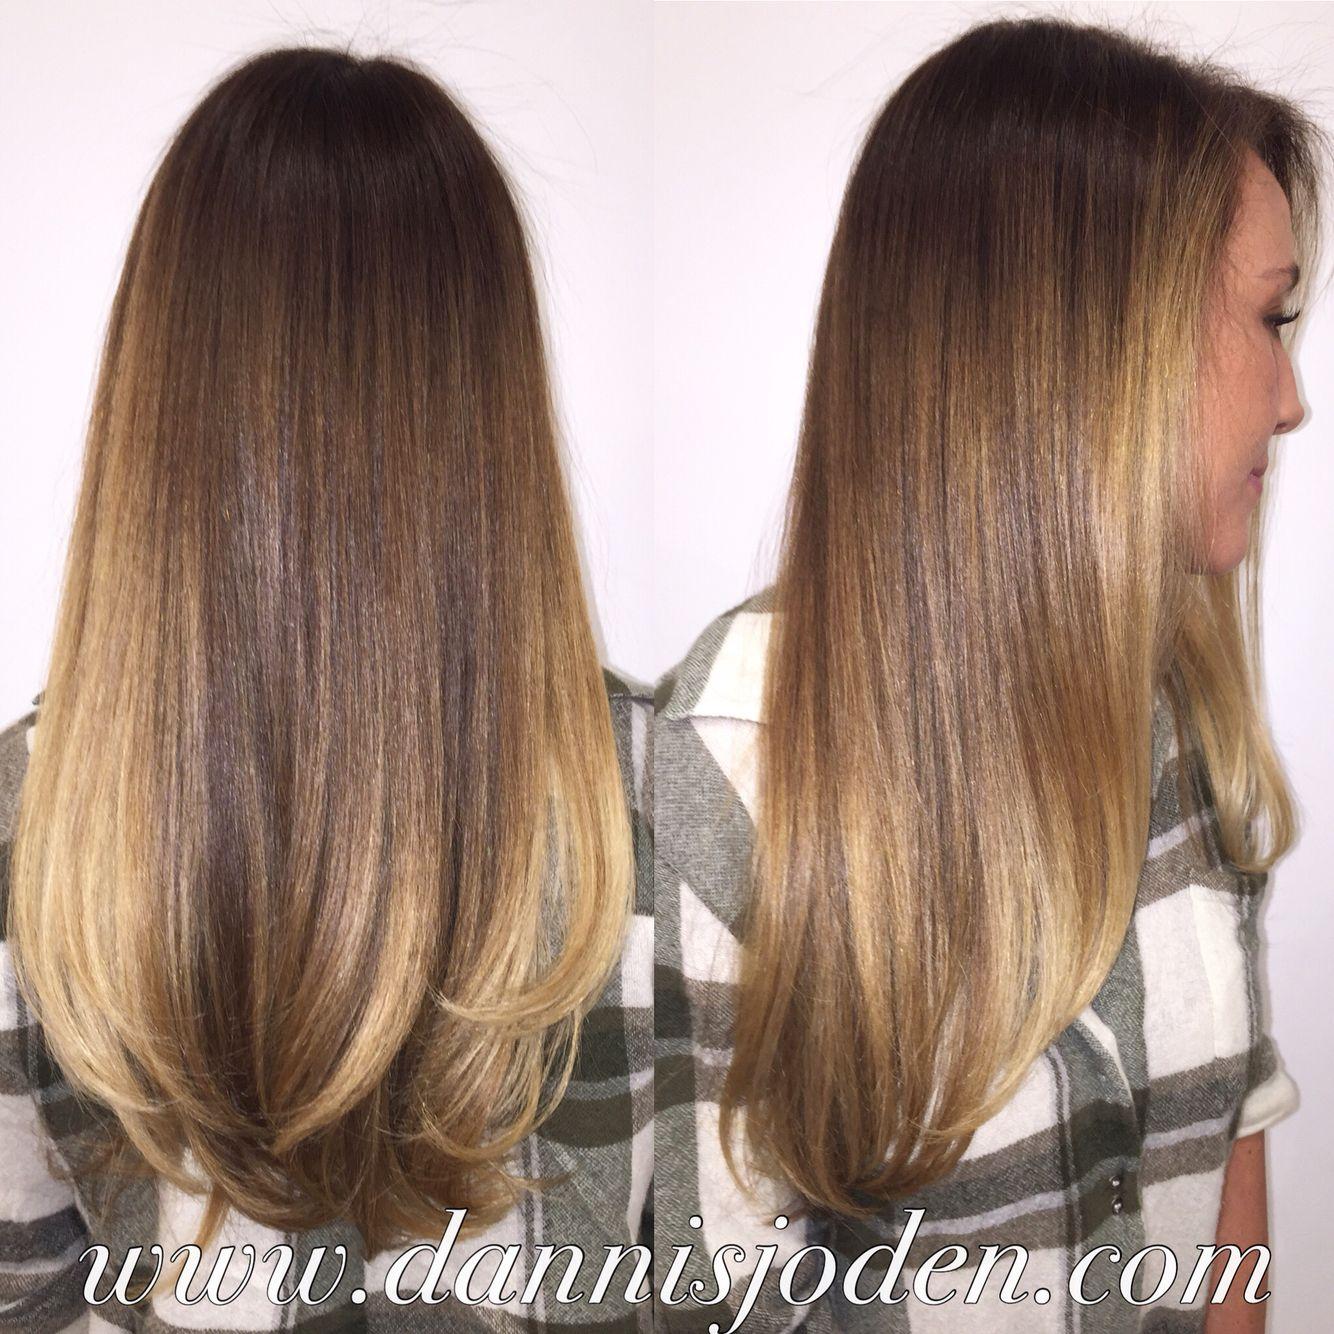 Gisele Bundchen Victorias Secret Inspired Balayage Ombr Hair By